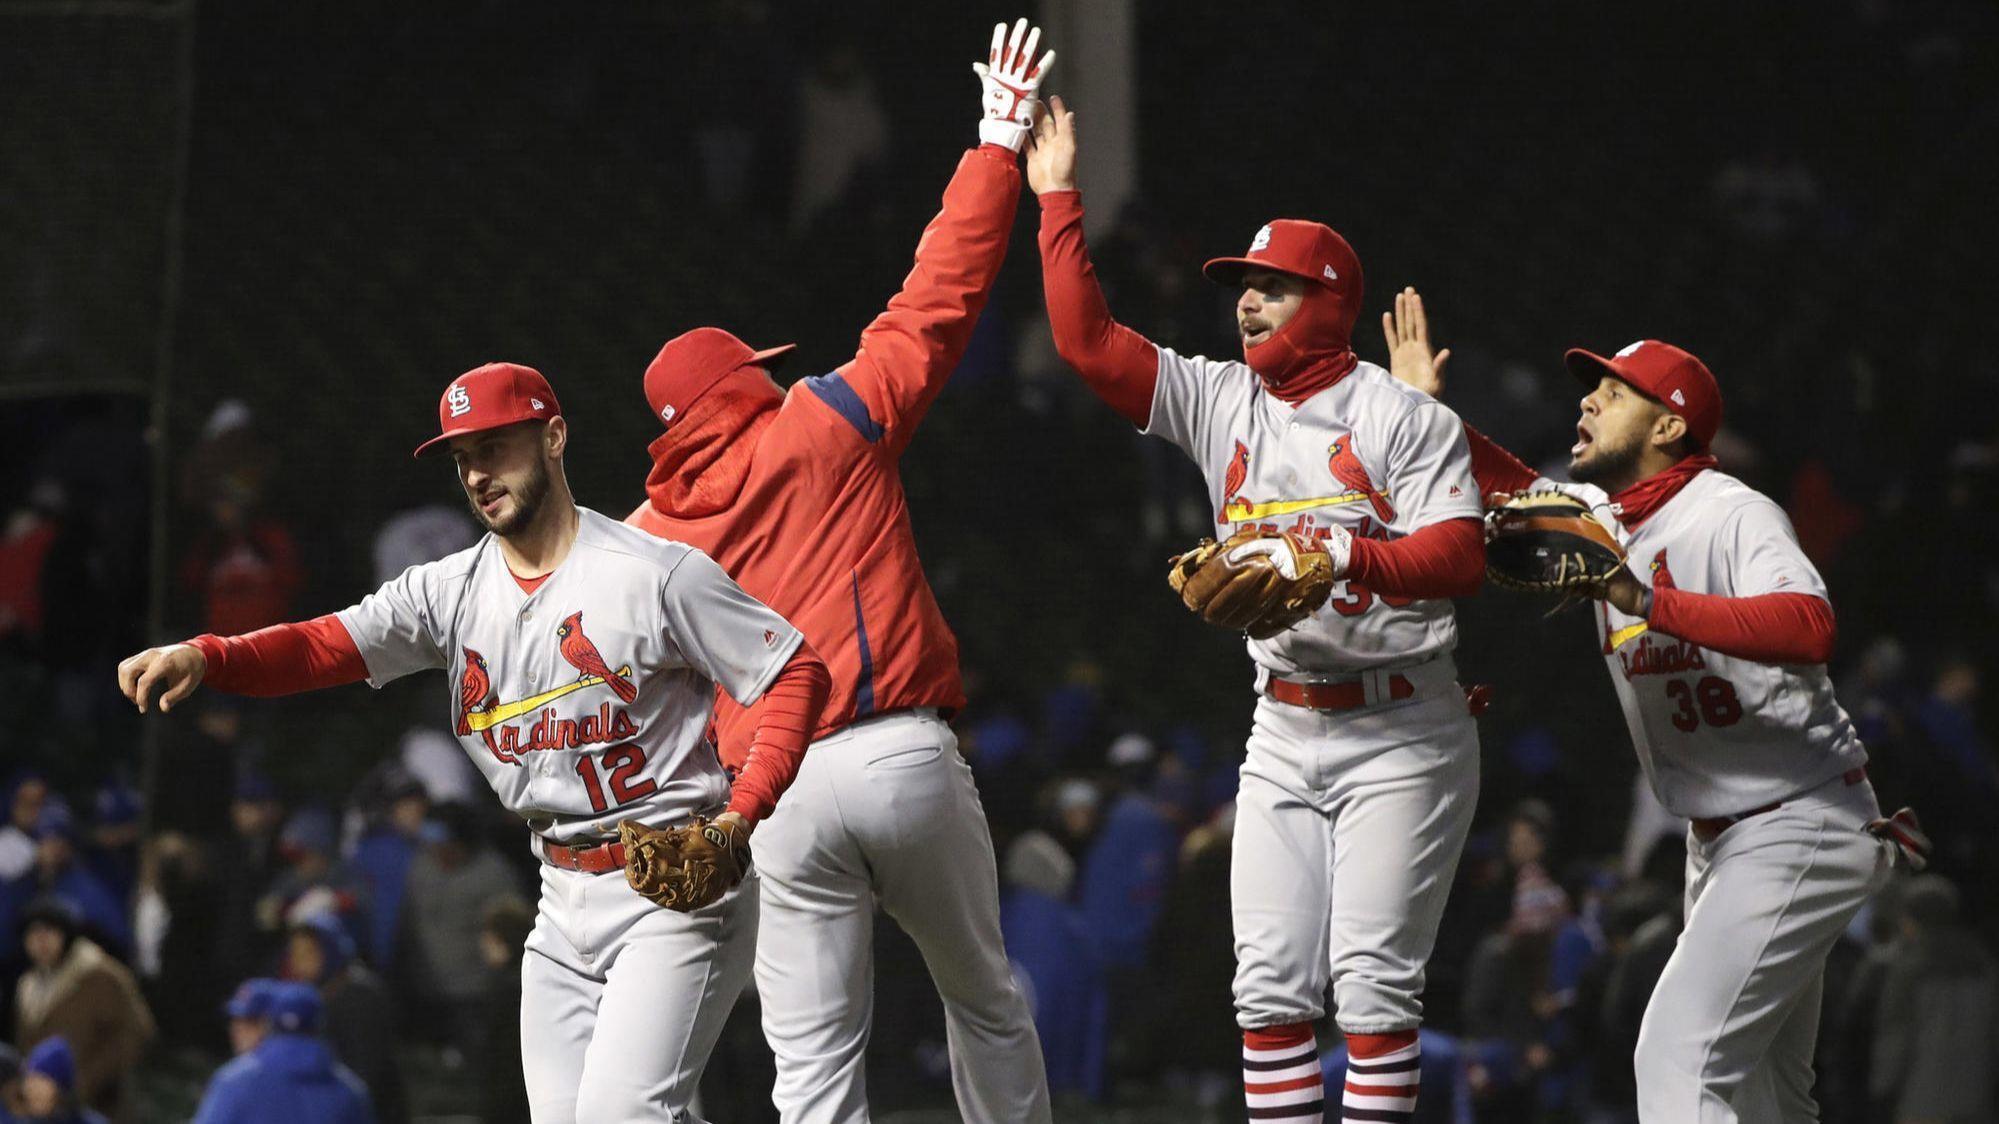 Ct-spt-rekindling-cubs-cardinals-rivalry-sullivan-20180417